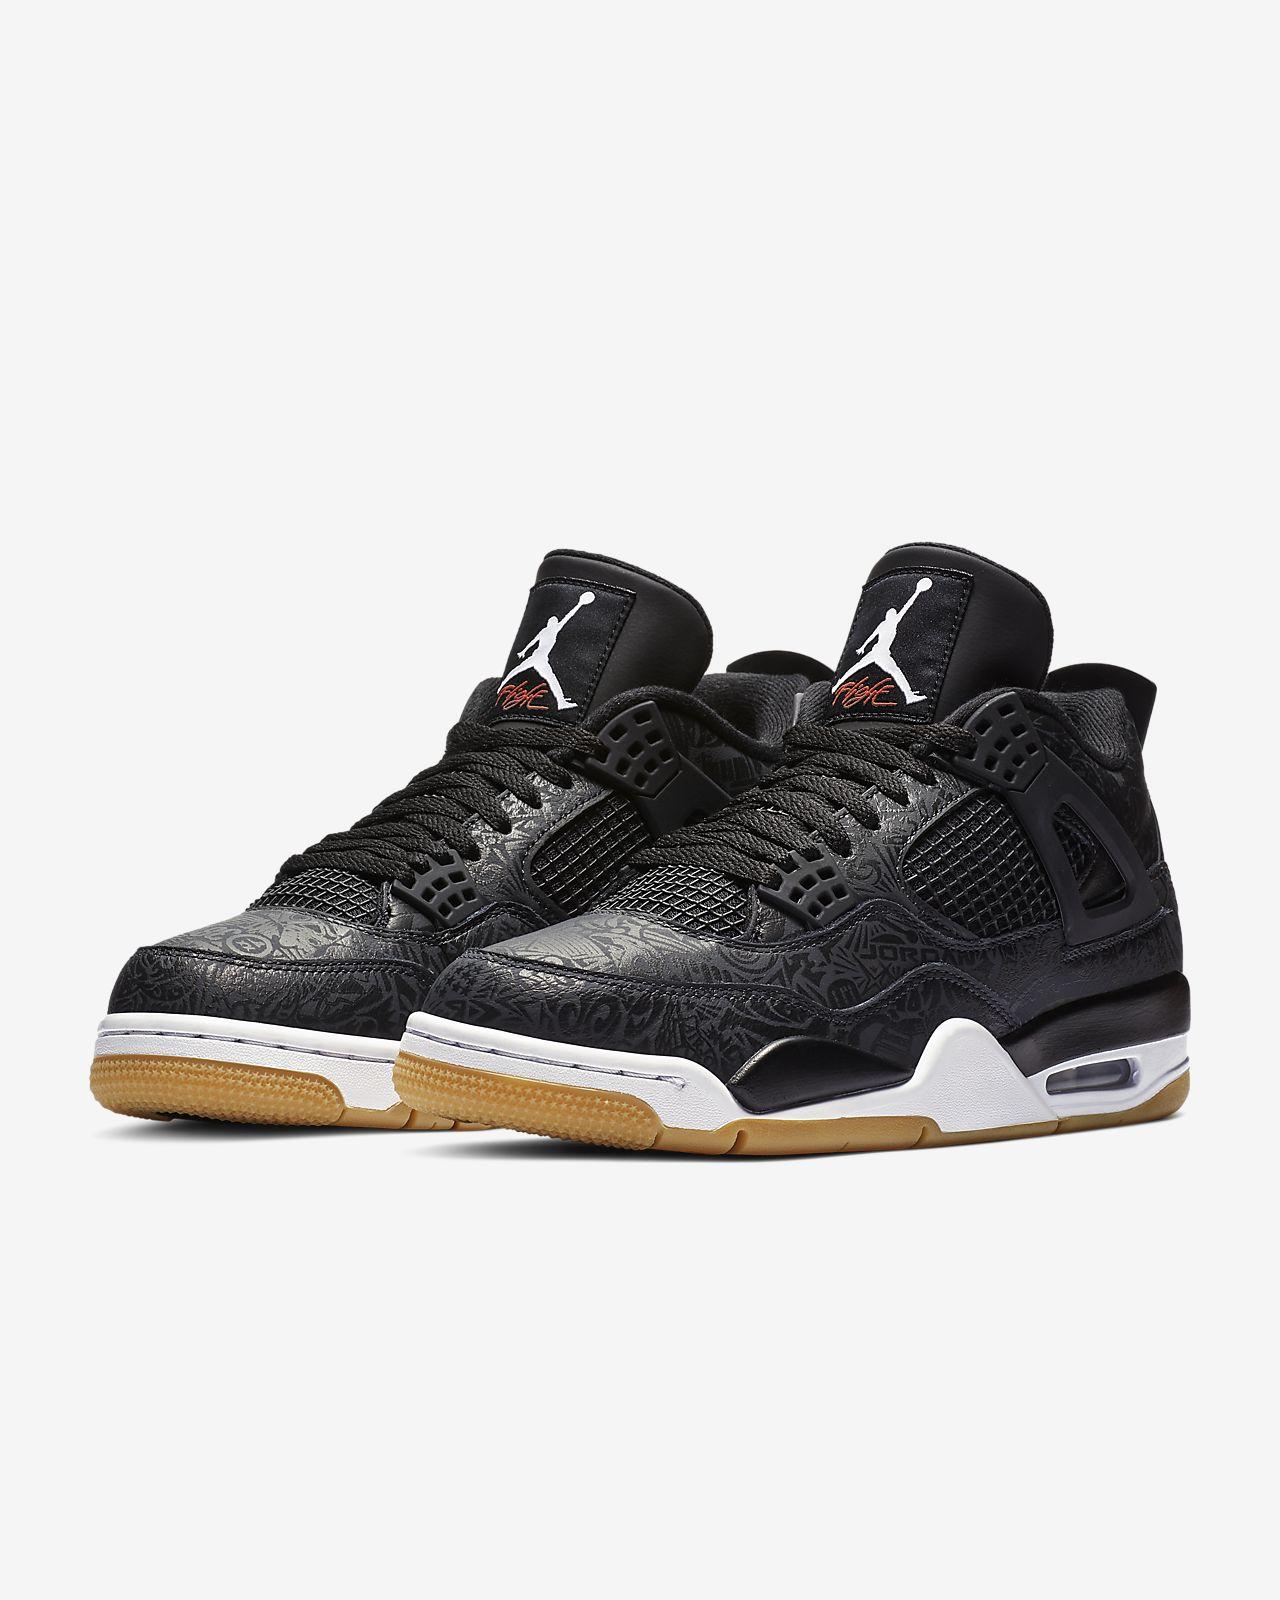 ca1dd50b2ee8c5 Air Jordan 4 Retro SE Men s Shoe. Nike.com